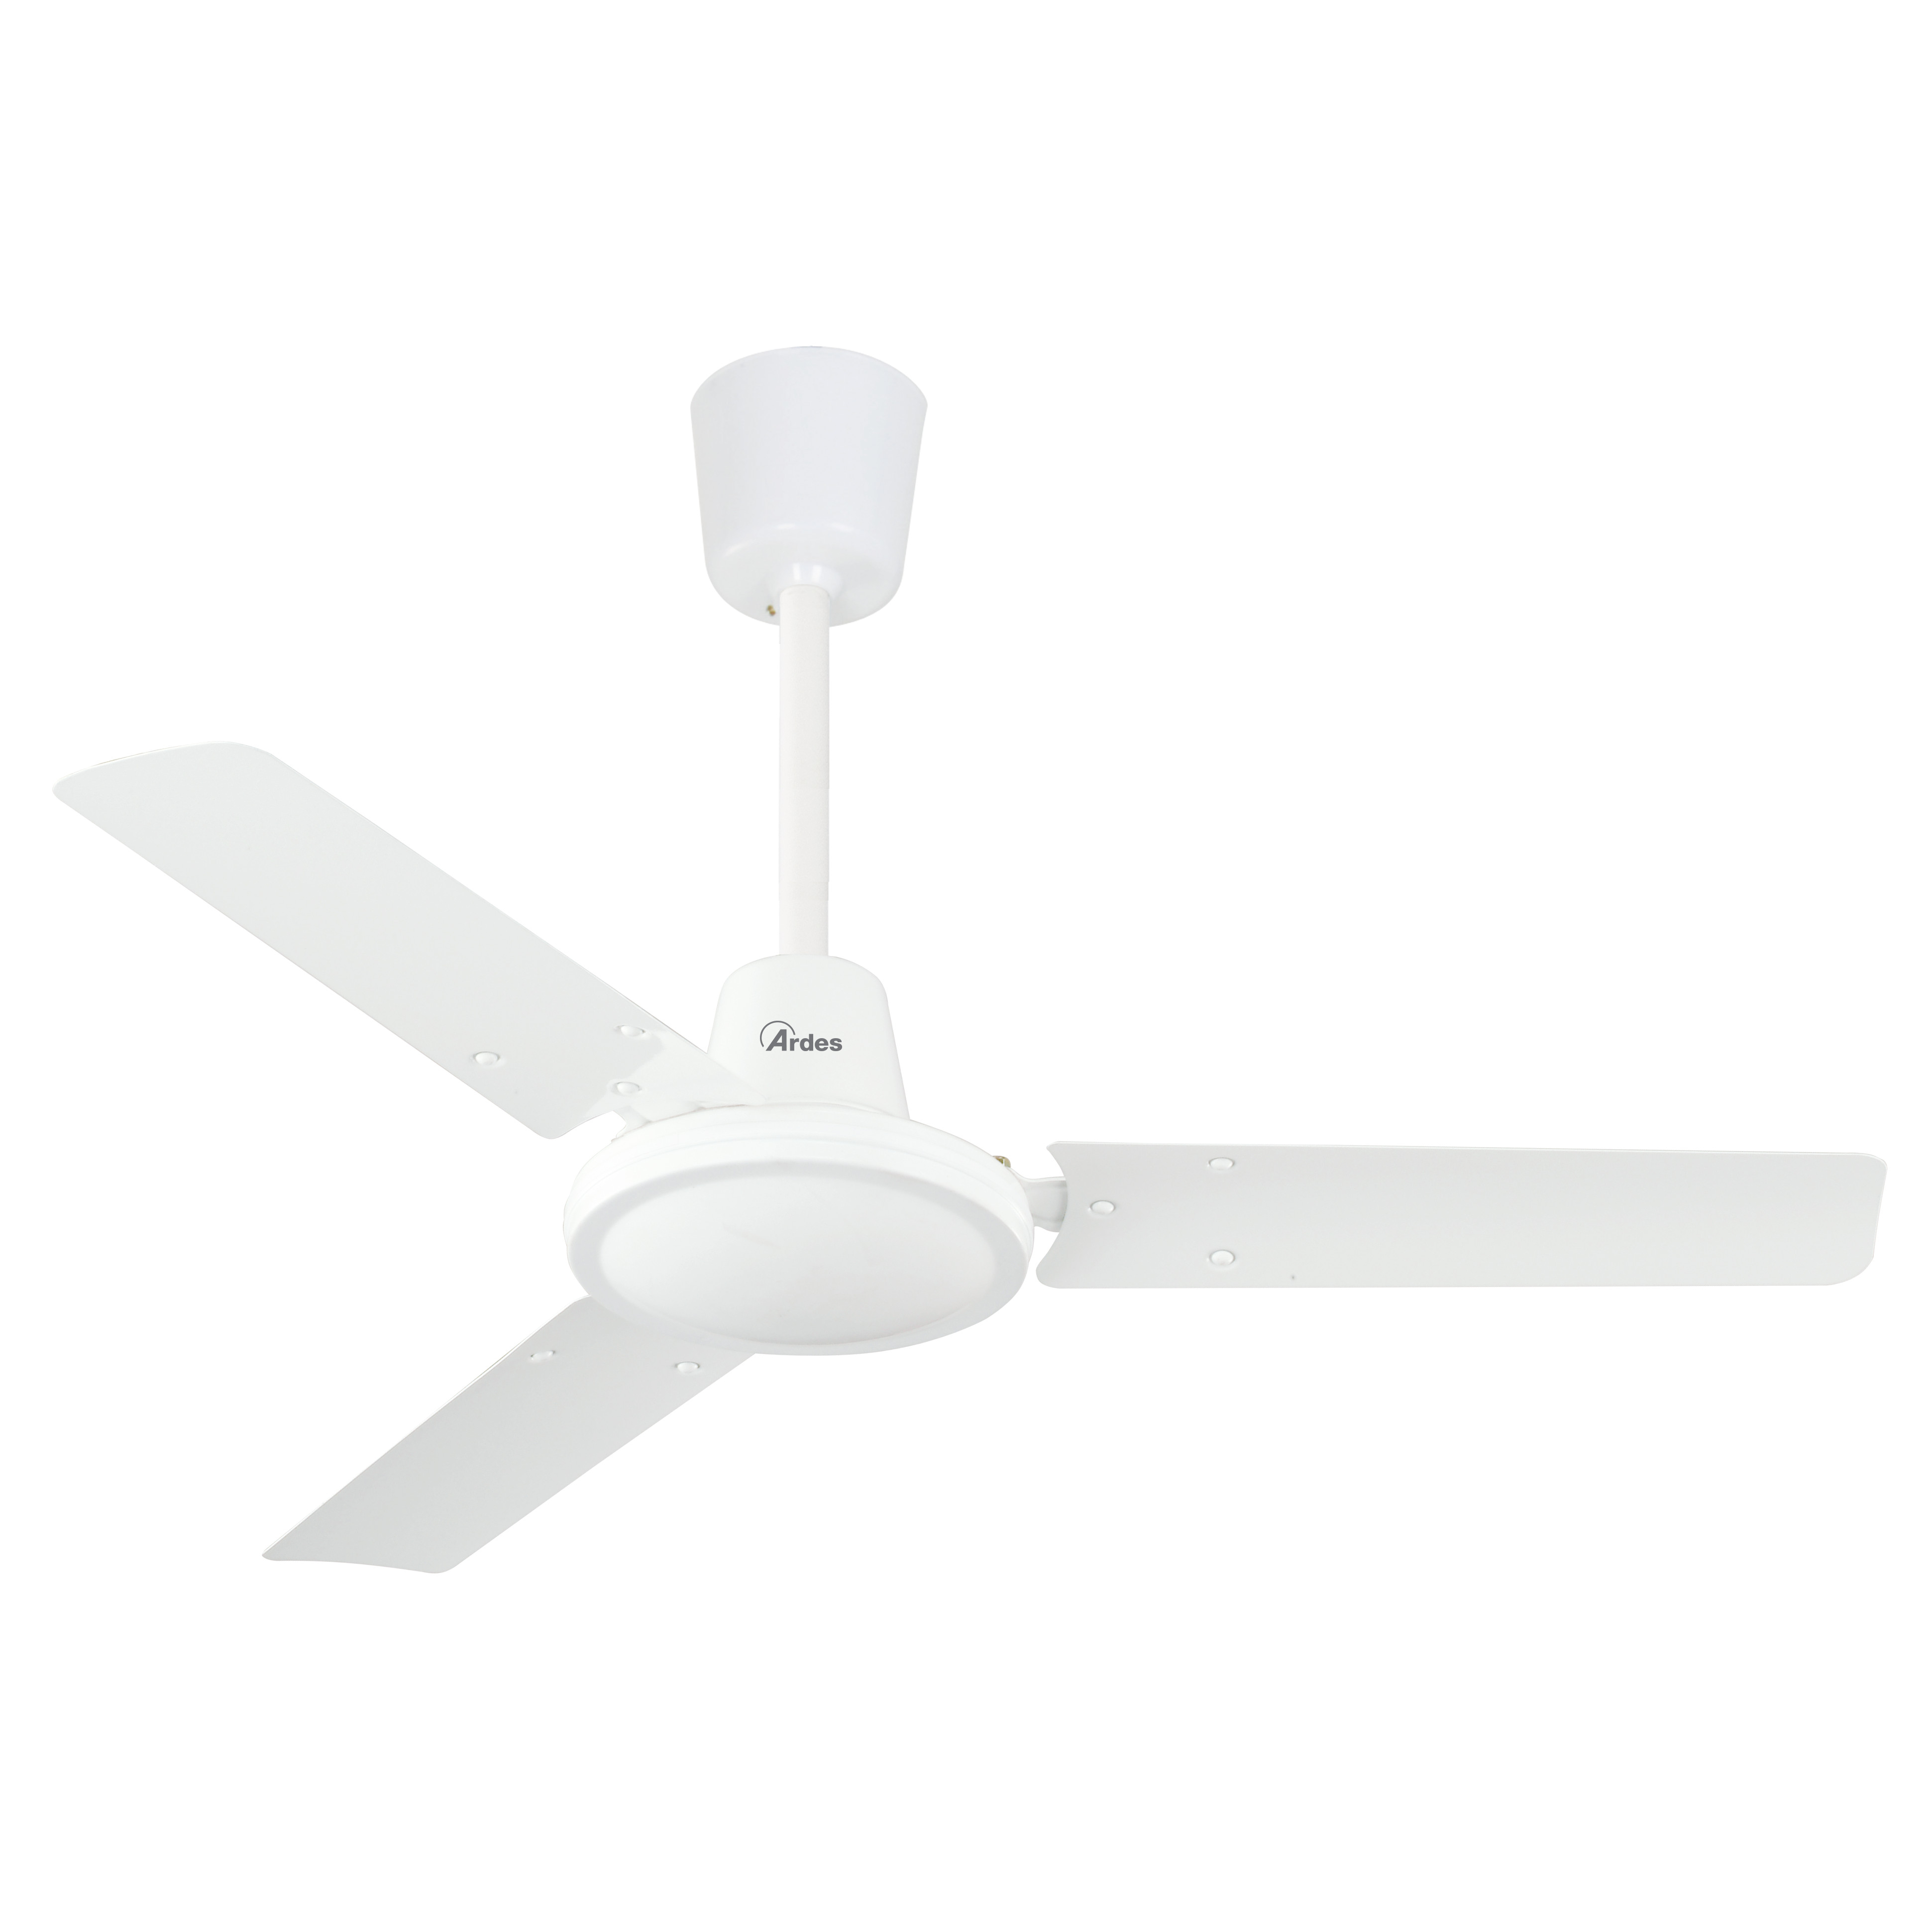 Ardes AR5A90 ventilatore Bianco